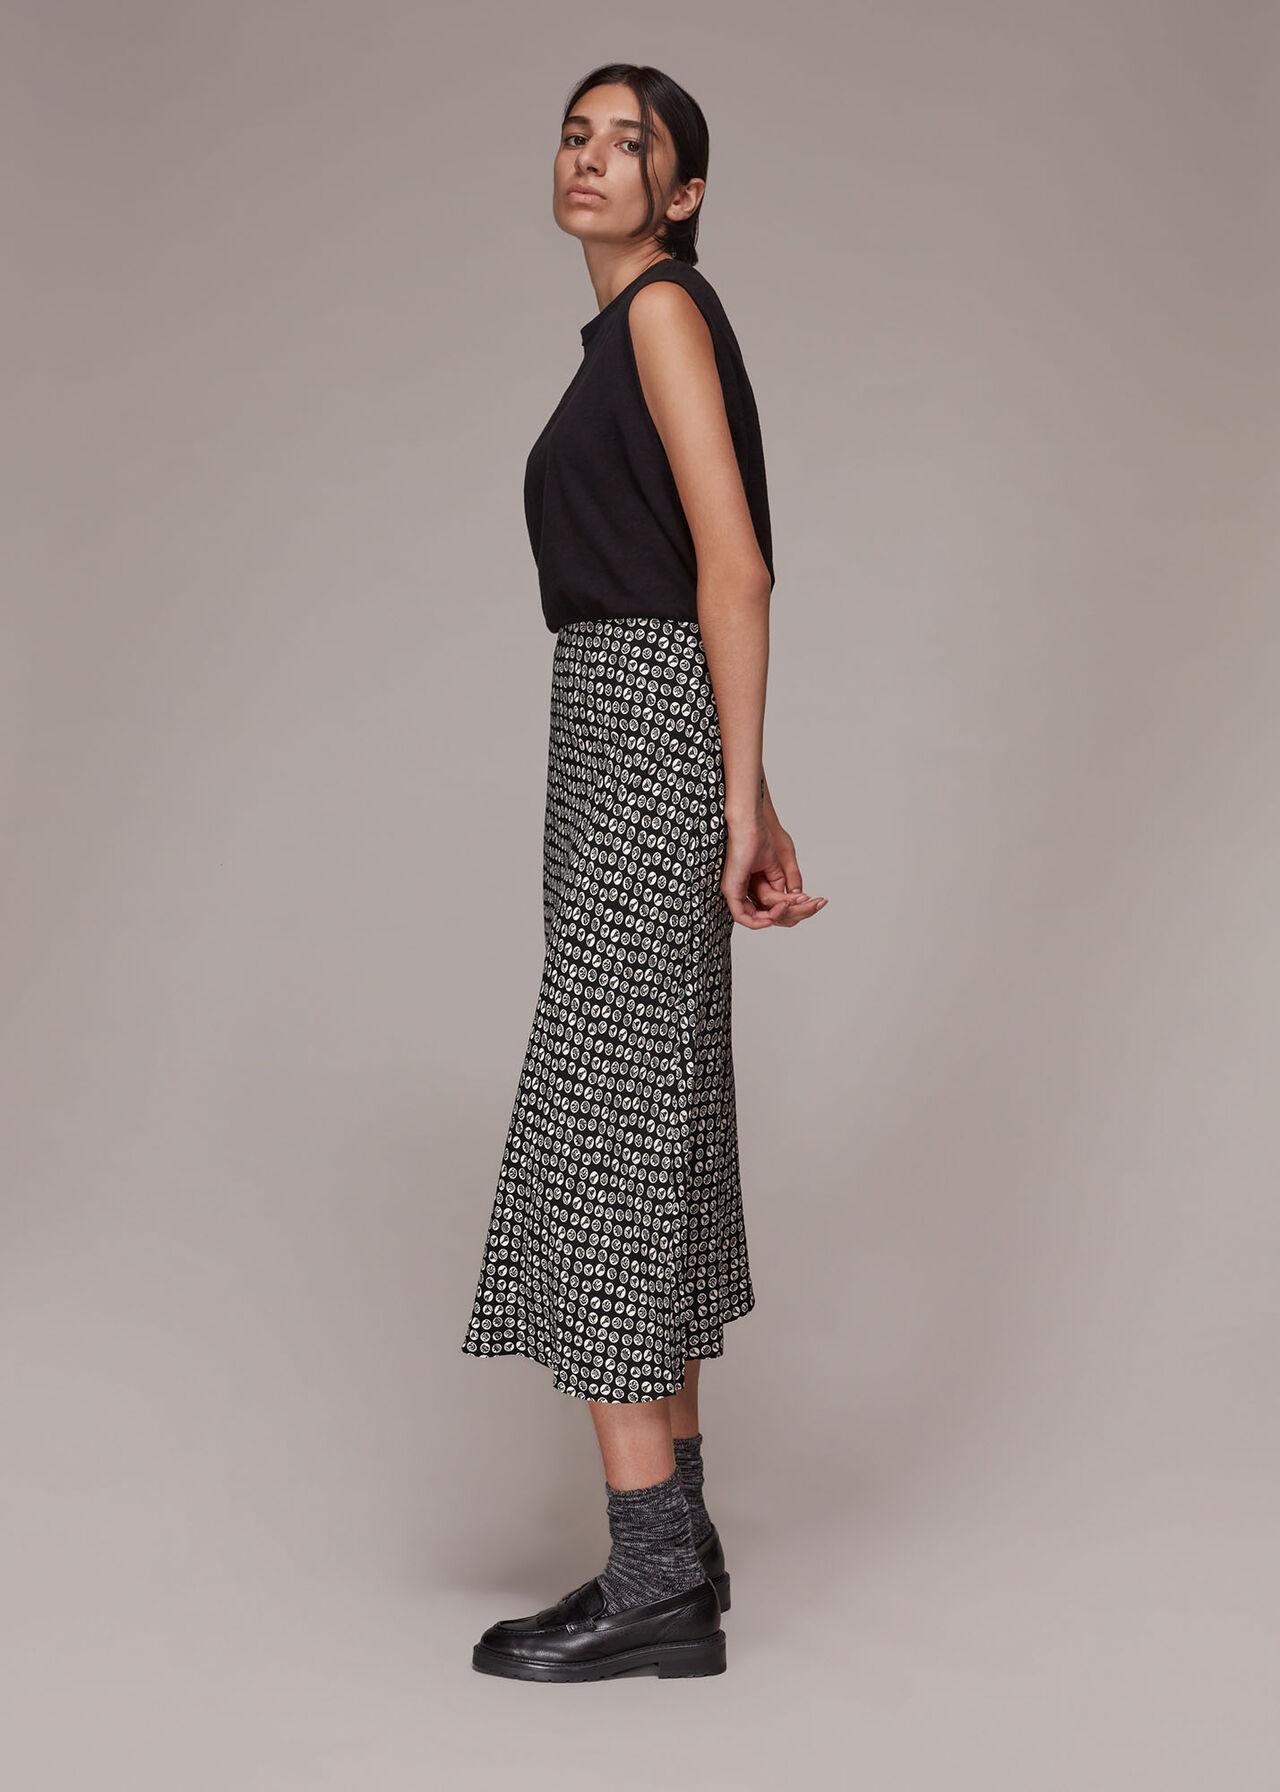 Landmark Print Bias Cut Skirt